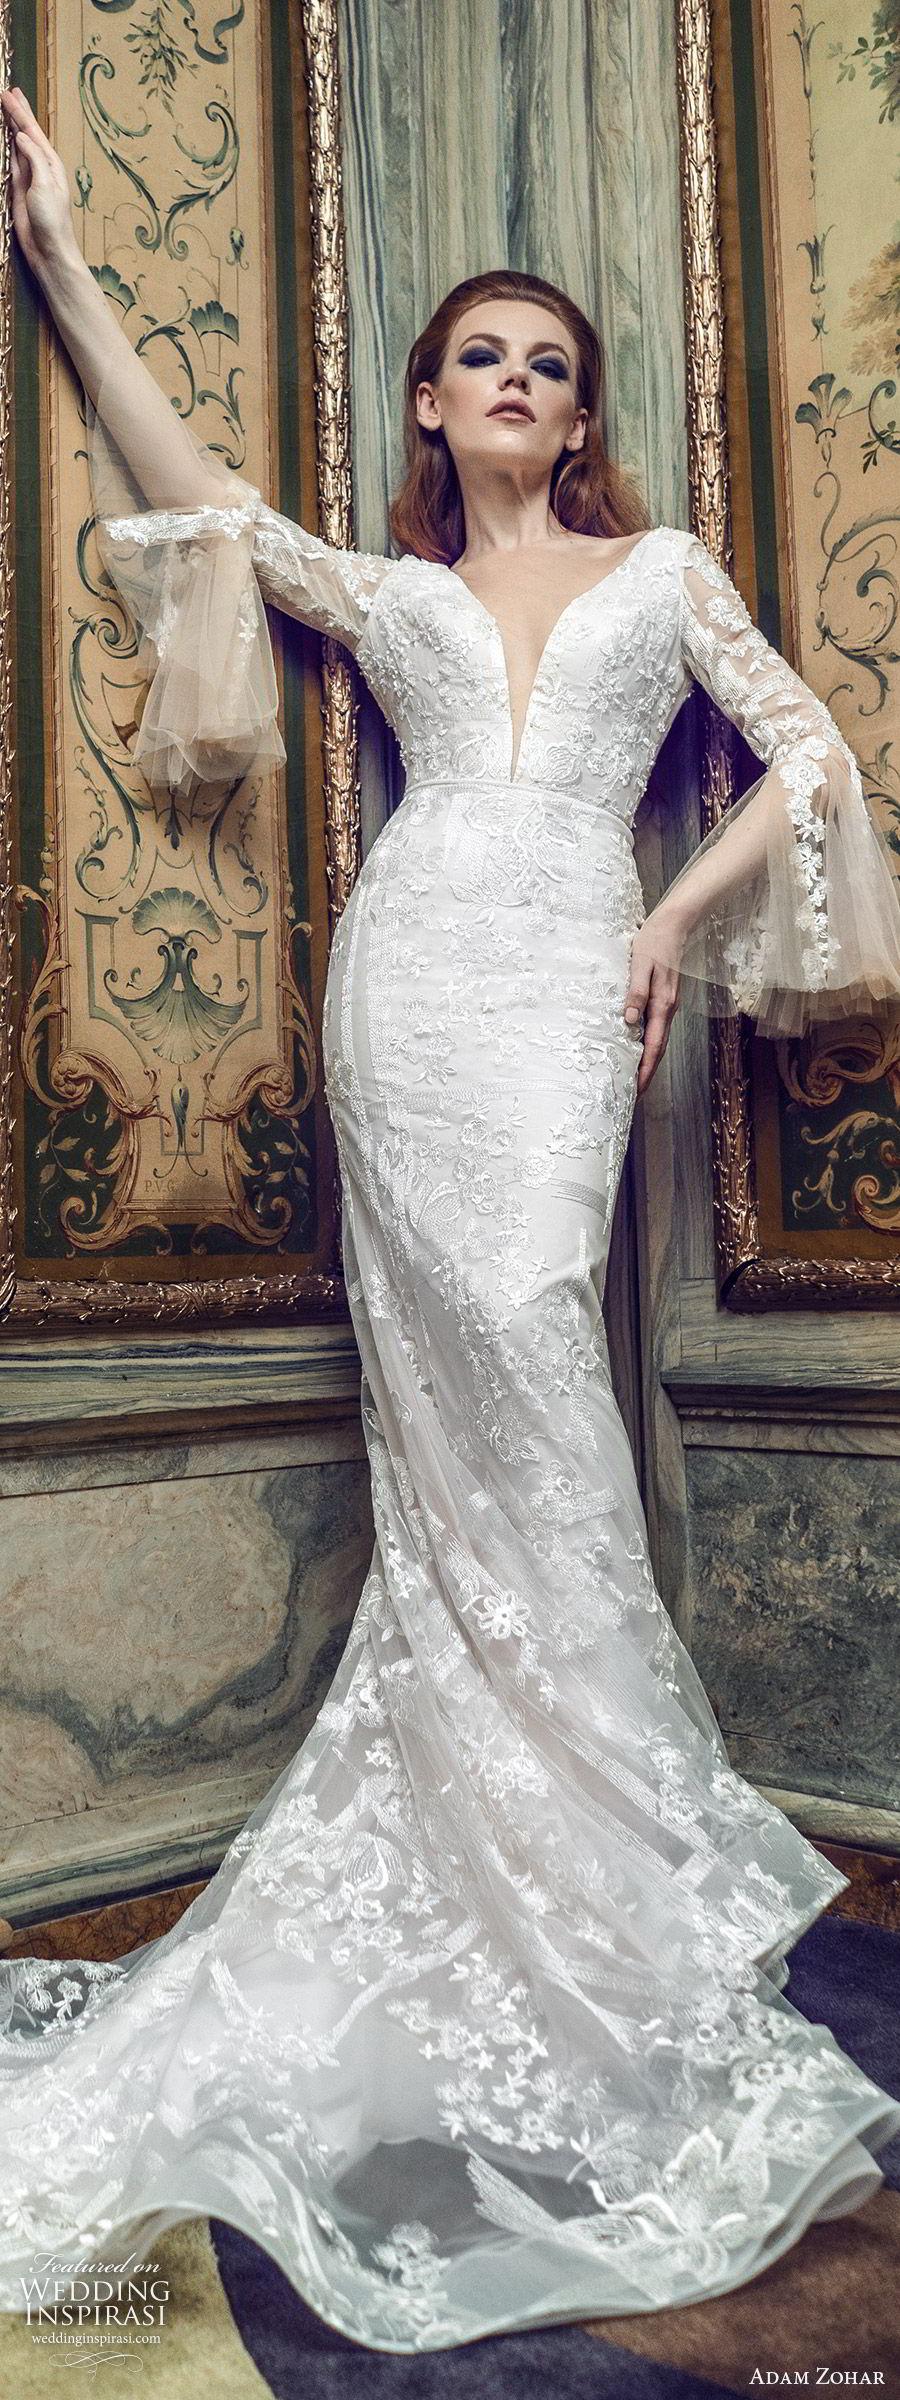 adam zohar 2020 bridal long bell sleeves deep v neckline fully embellished lace sheath mermaid wedding dress (3) boho chic romantic chapel train lv